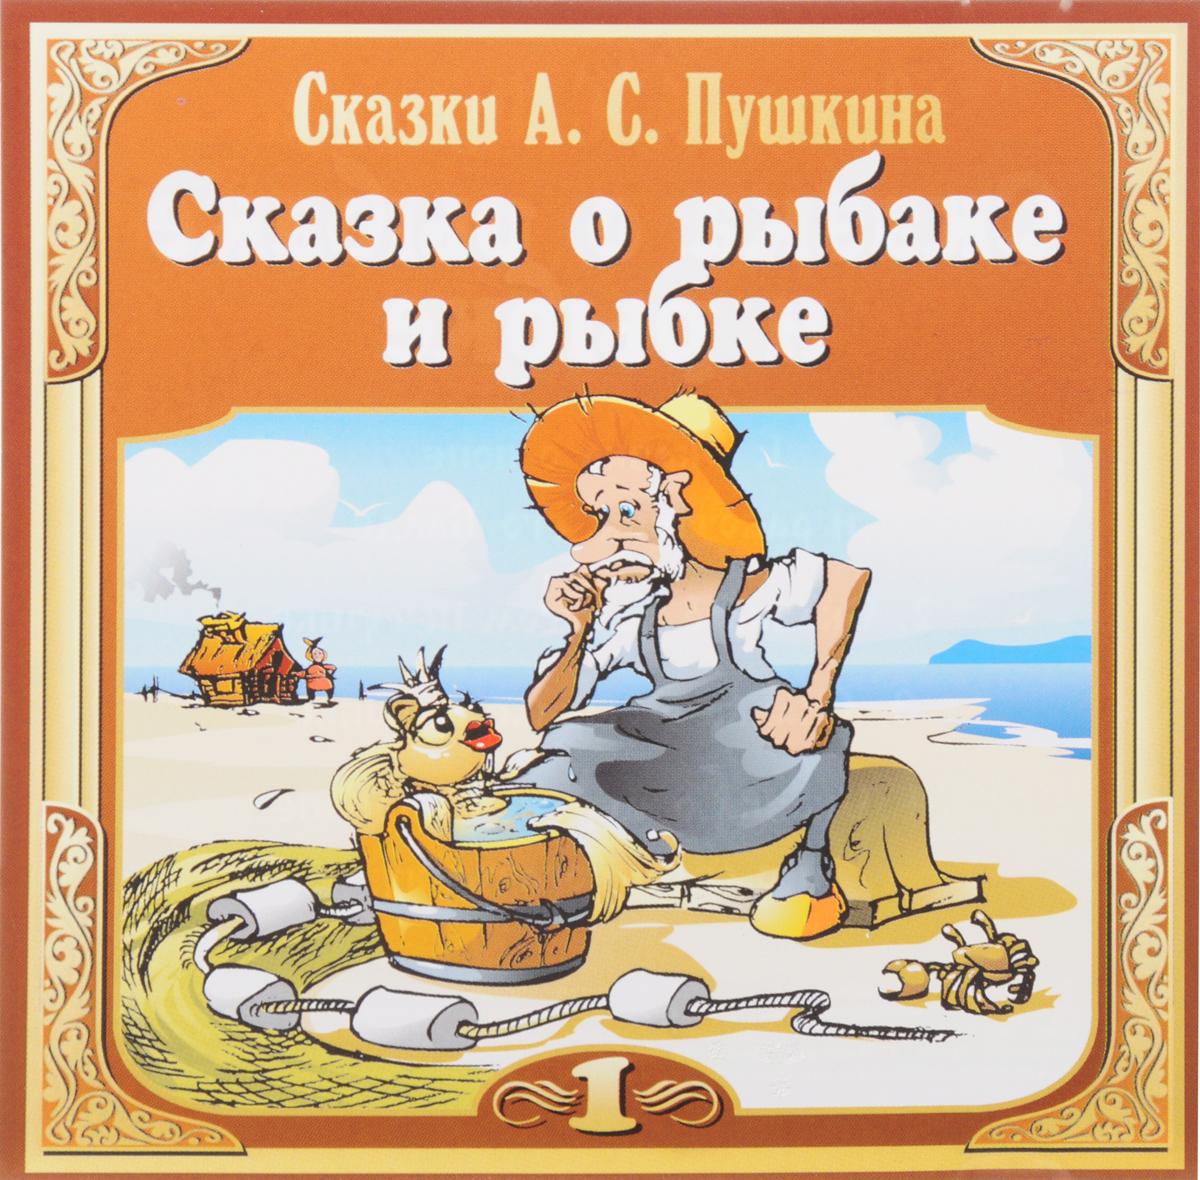 Сказка о рыбаке и рыбке (аудиокнига CD) overlord маруяма куганэ мп3 аудиокнига том 8 скачать